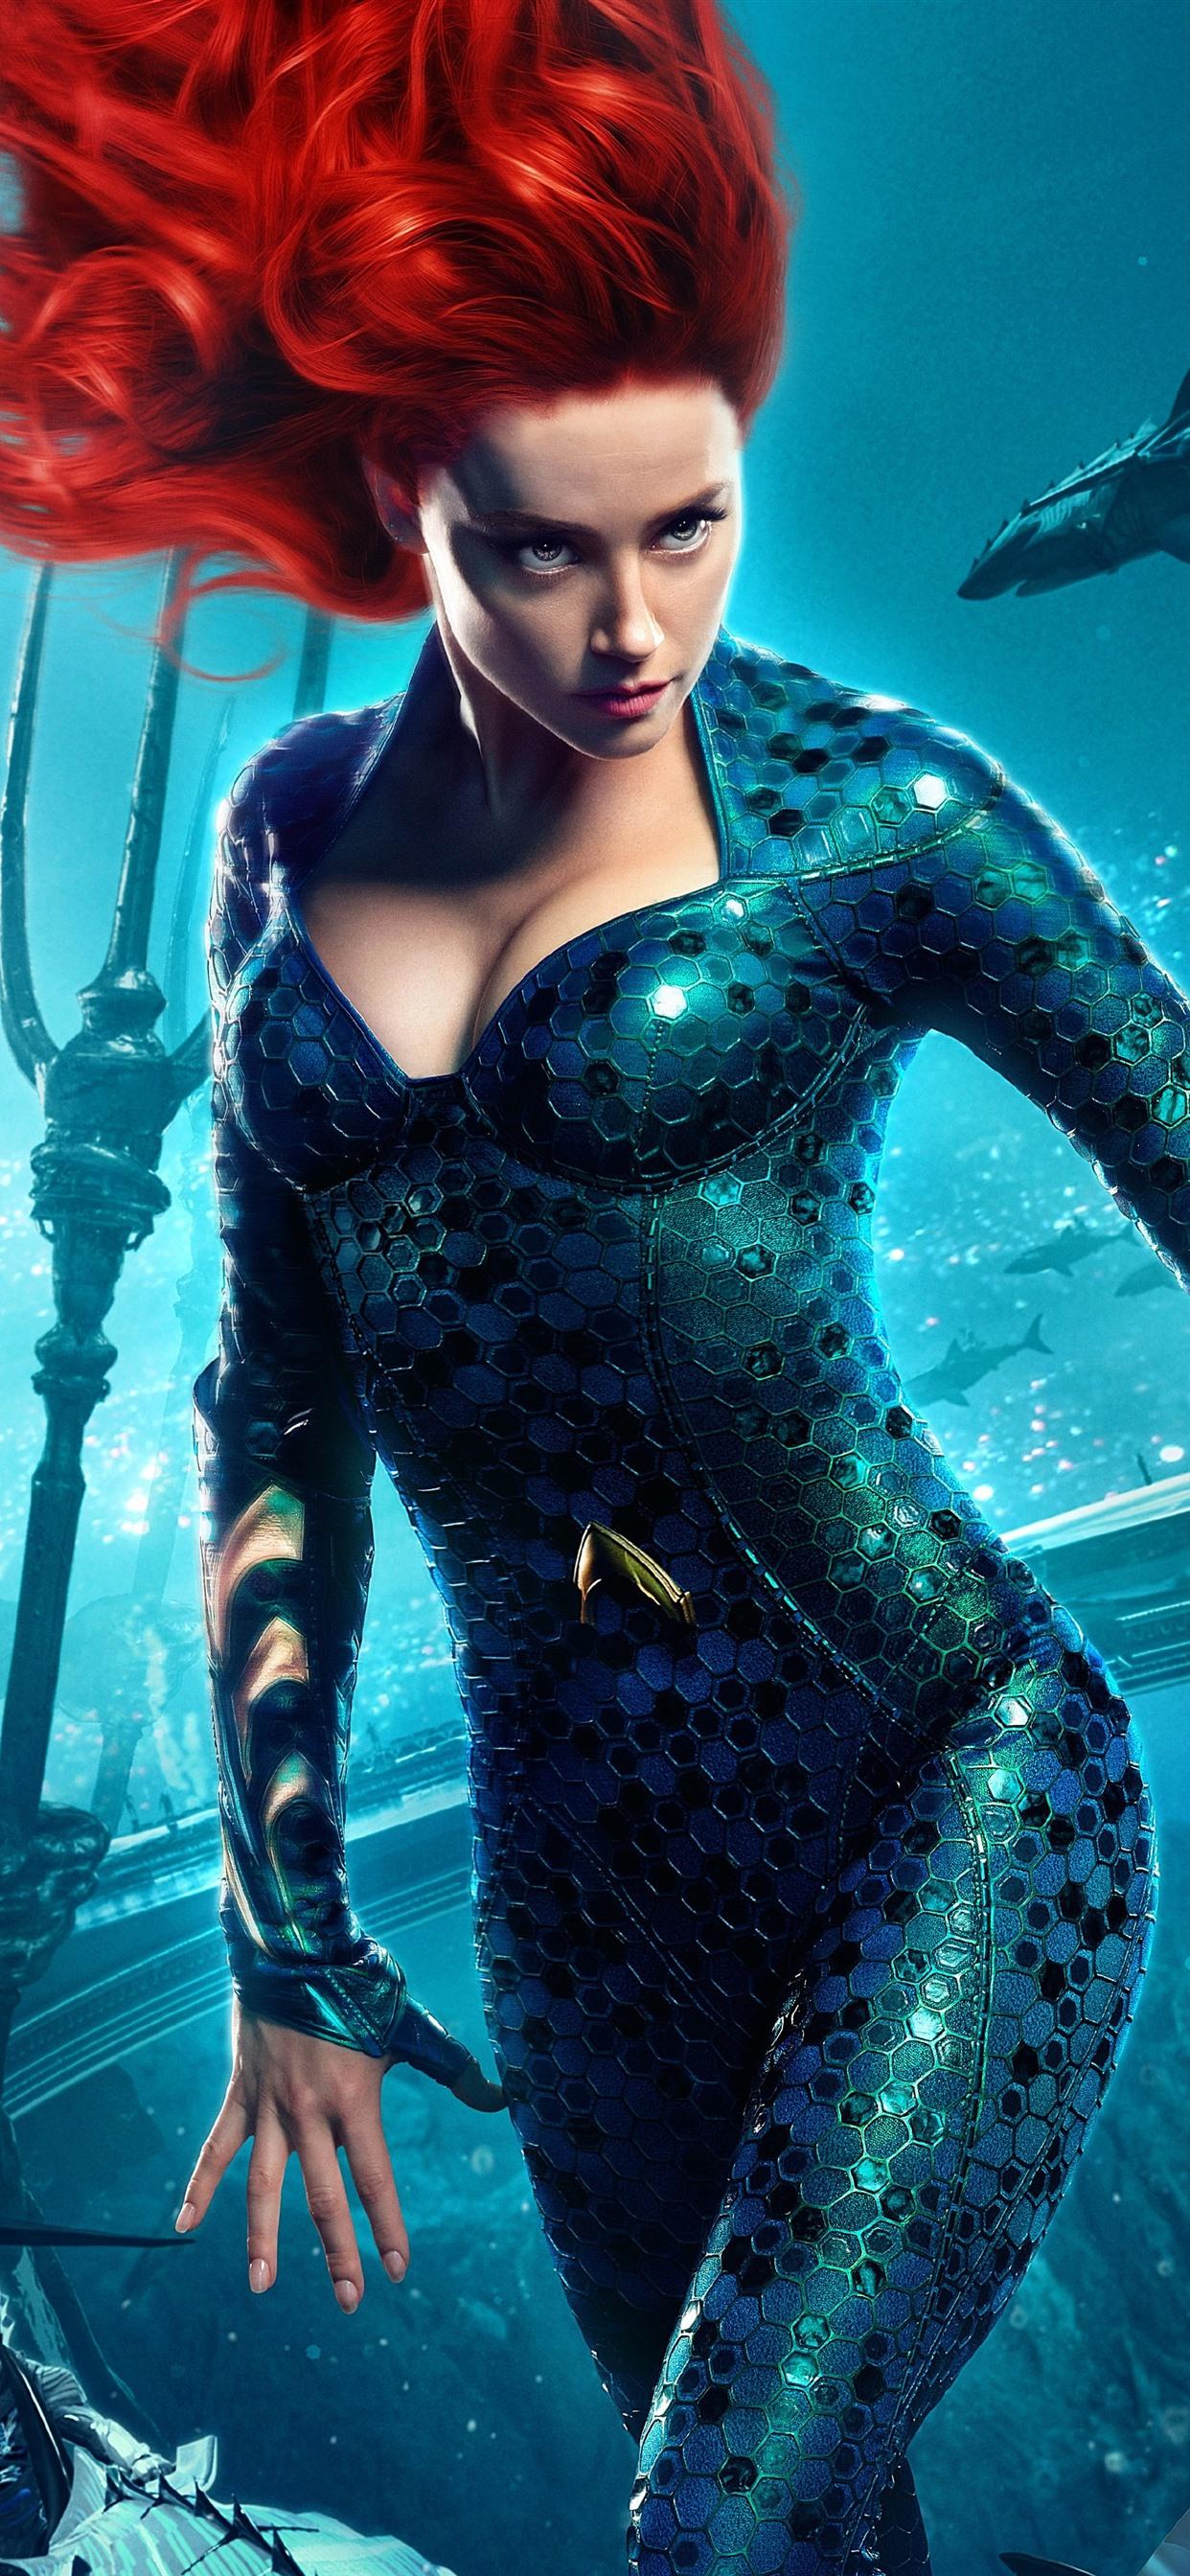 Amber Heard Mera Aquaman 2018 1242x2688 iPhone XS Max wallpaper 1242x2688